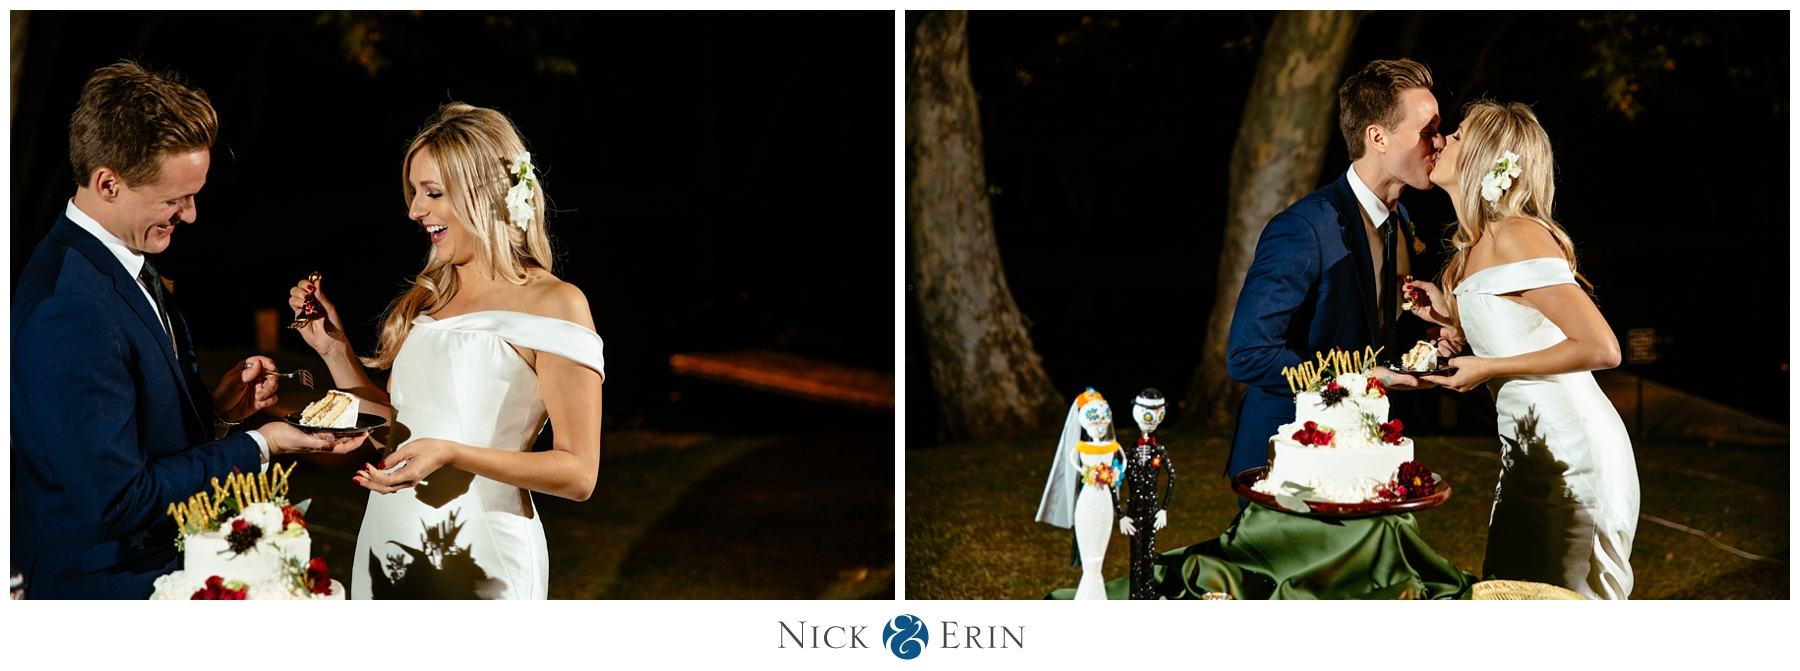 Donner_Photography_Sedona Arizona Wedding_Alissa and Tom_0070